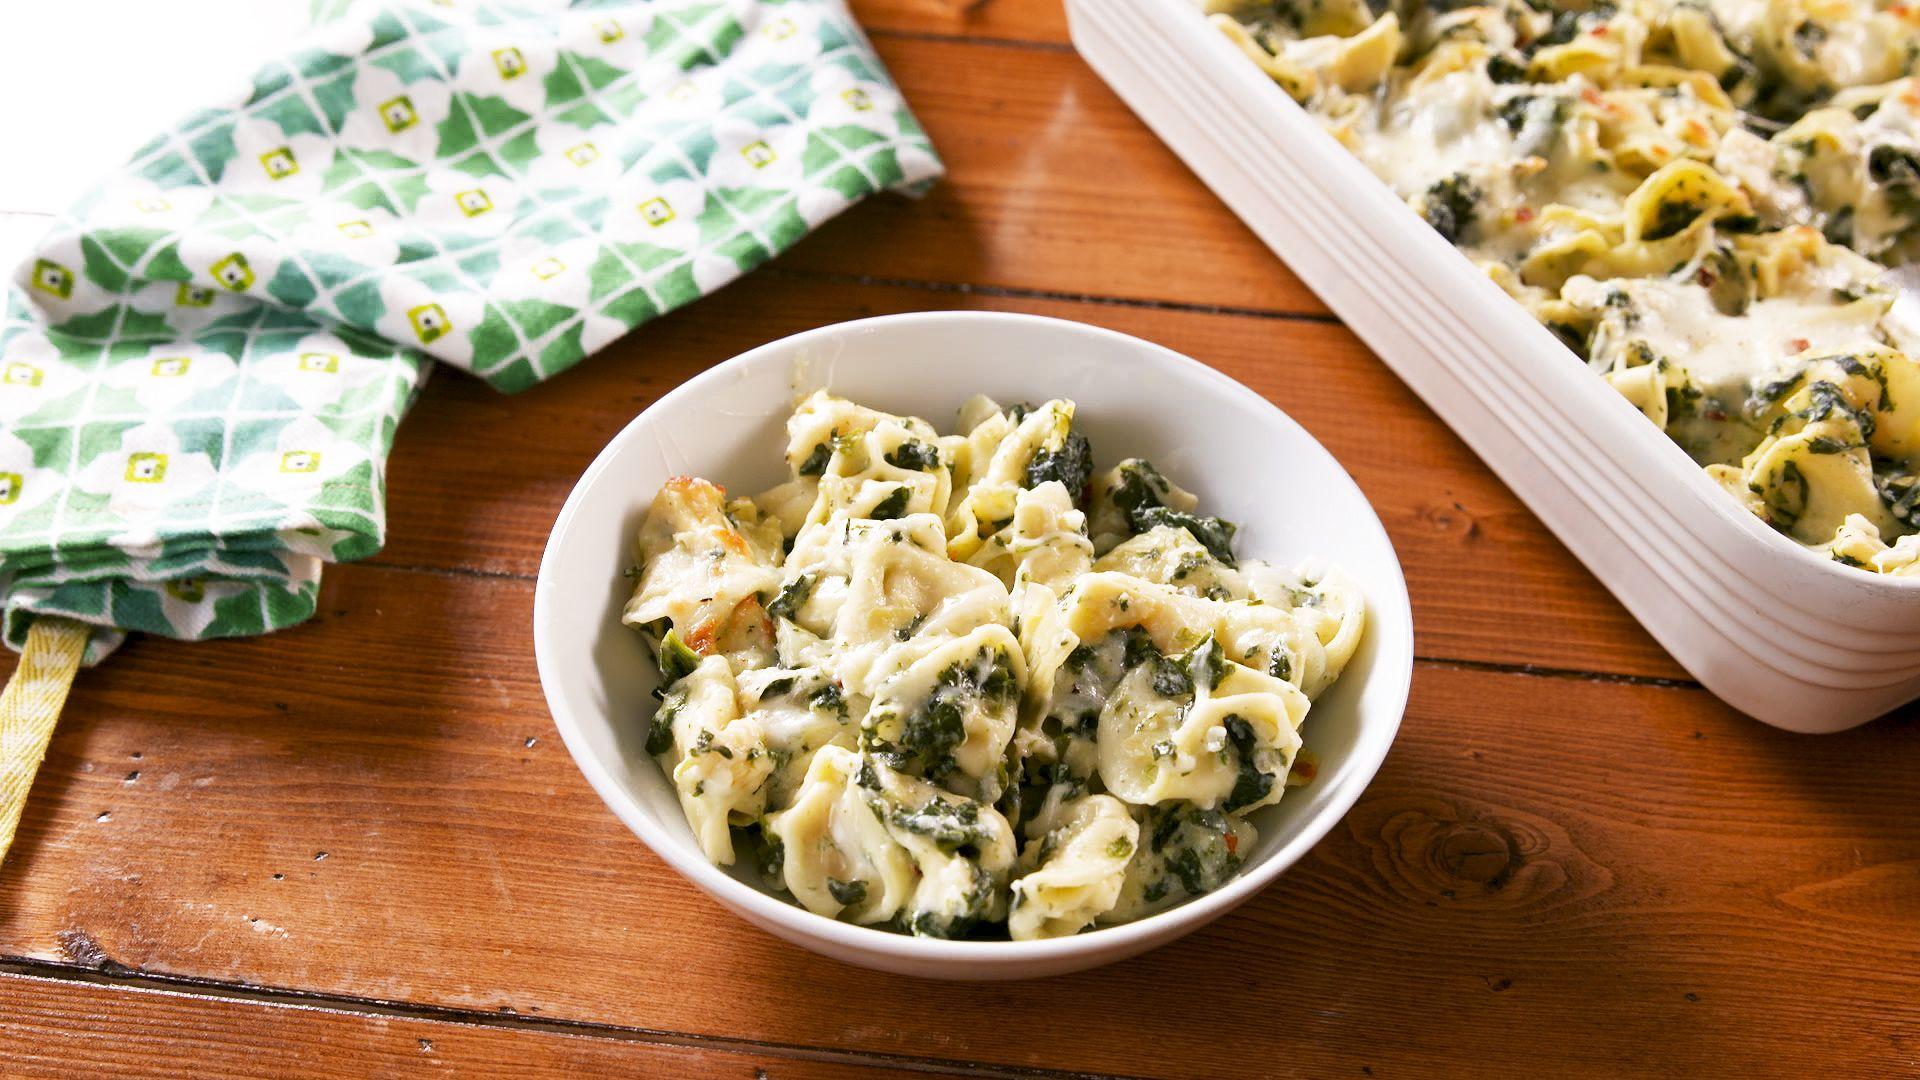 Spinach Artichoke Baked Tortellini